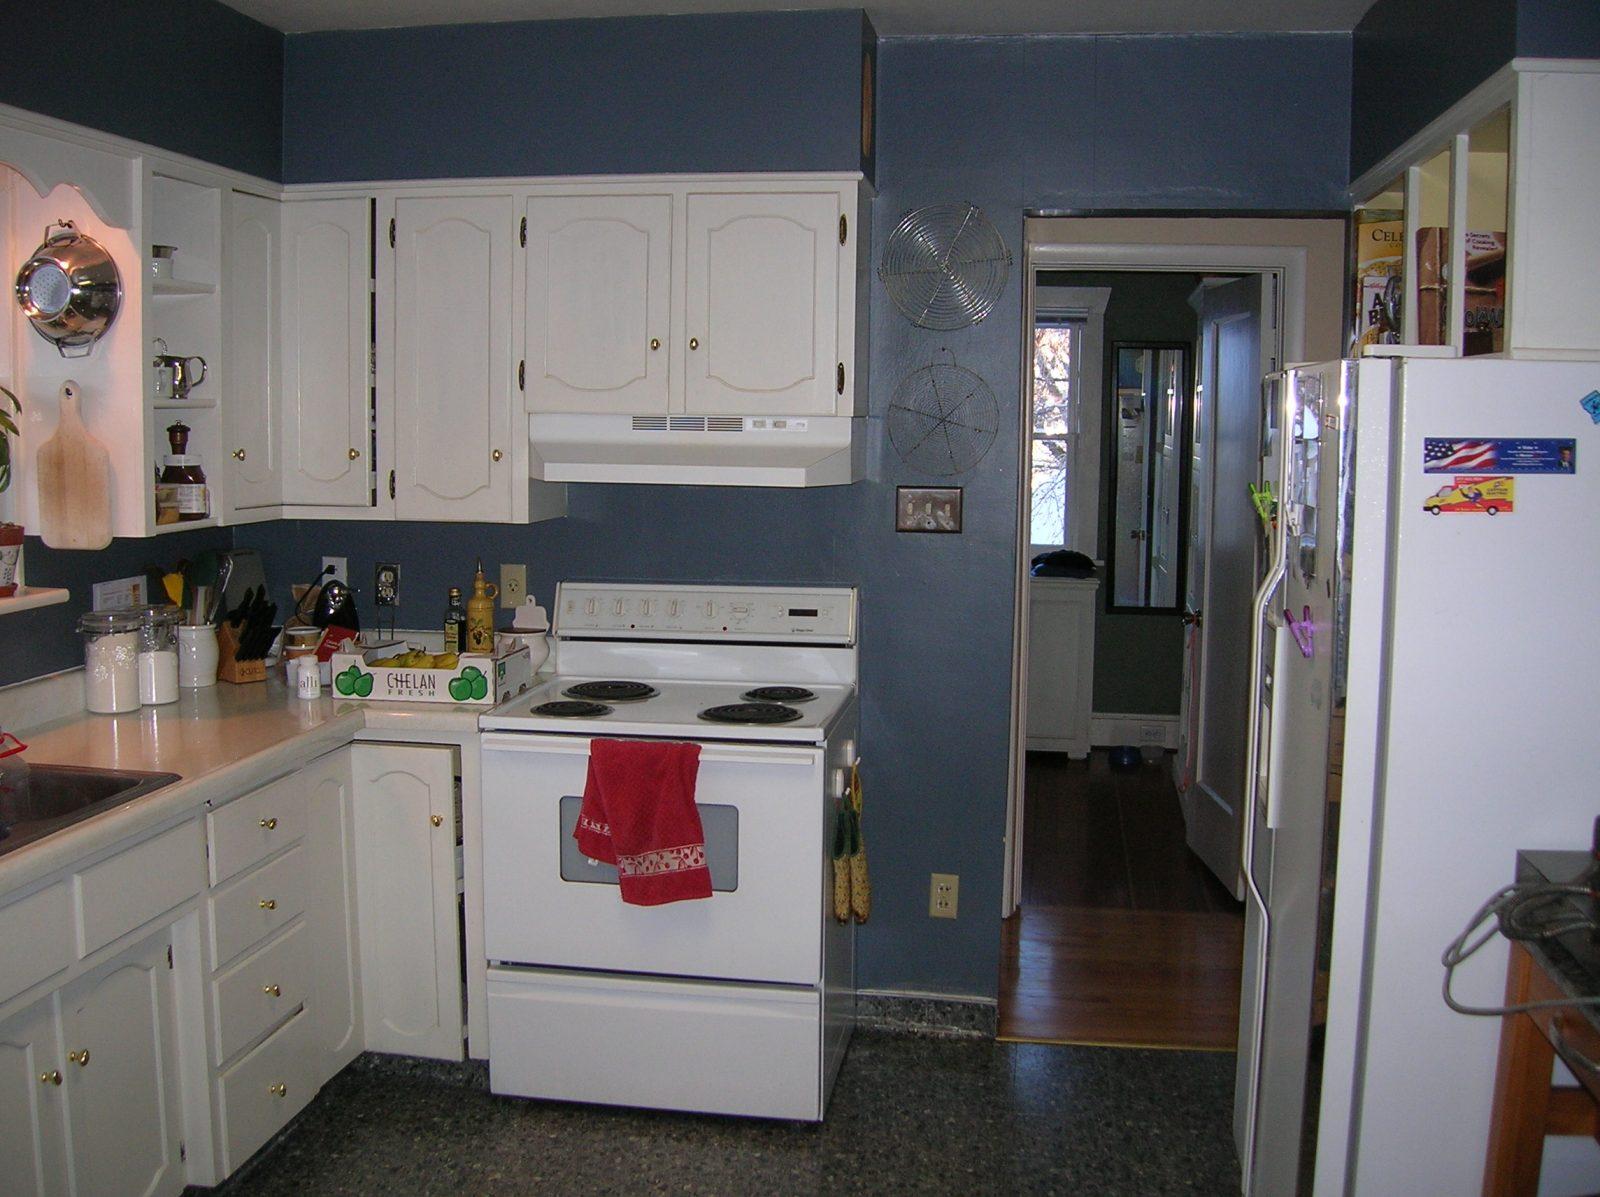 Before_Interior Remodel_Kitchen Renovation_Bungalow Kitchen Ideas | Renovation Design Group